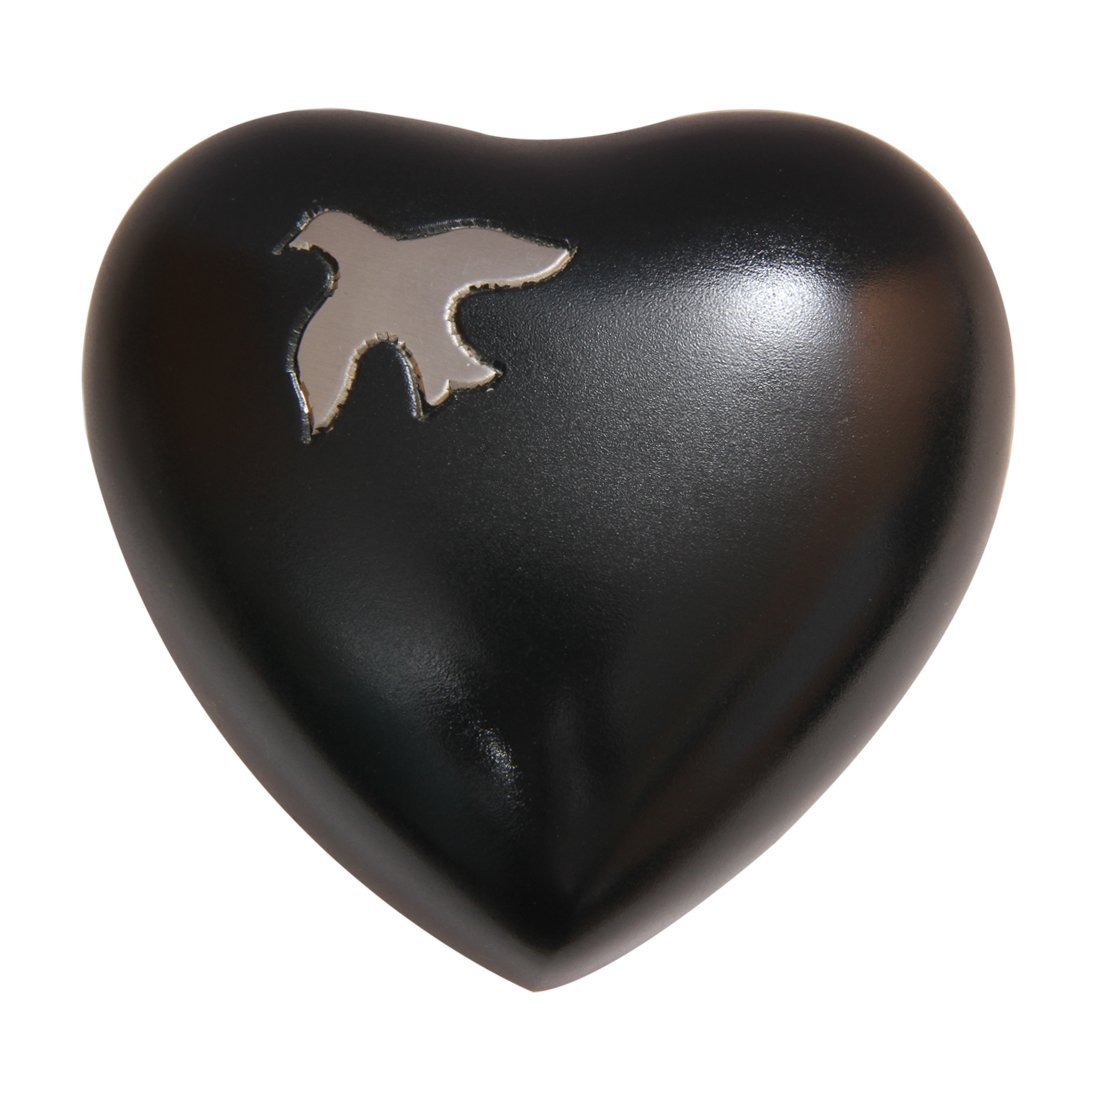 Aria Ascending Dove Heart Keepsake Urn Ashes, Funeral Heart Urns